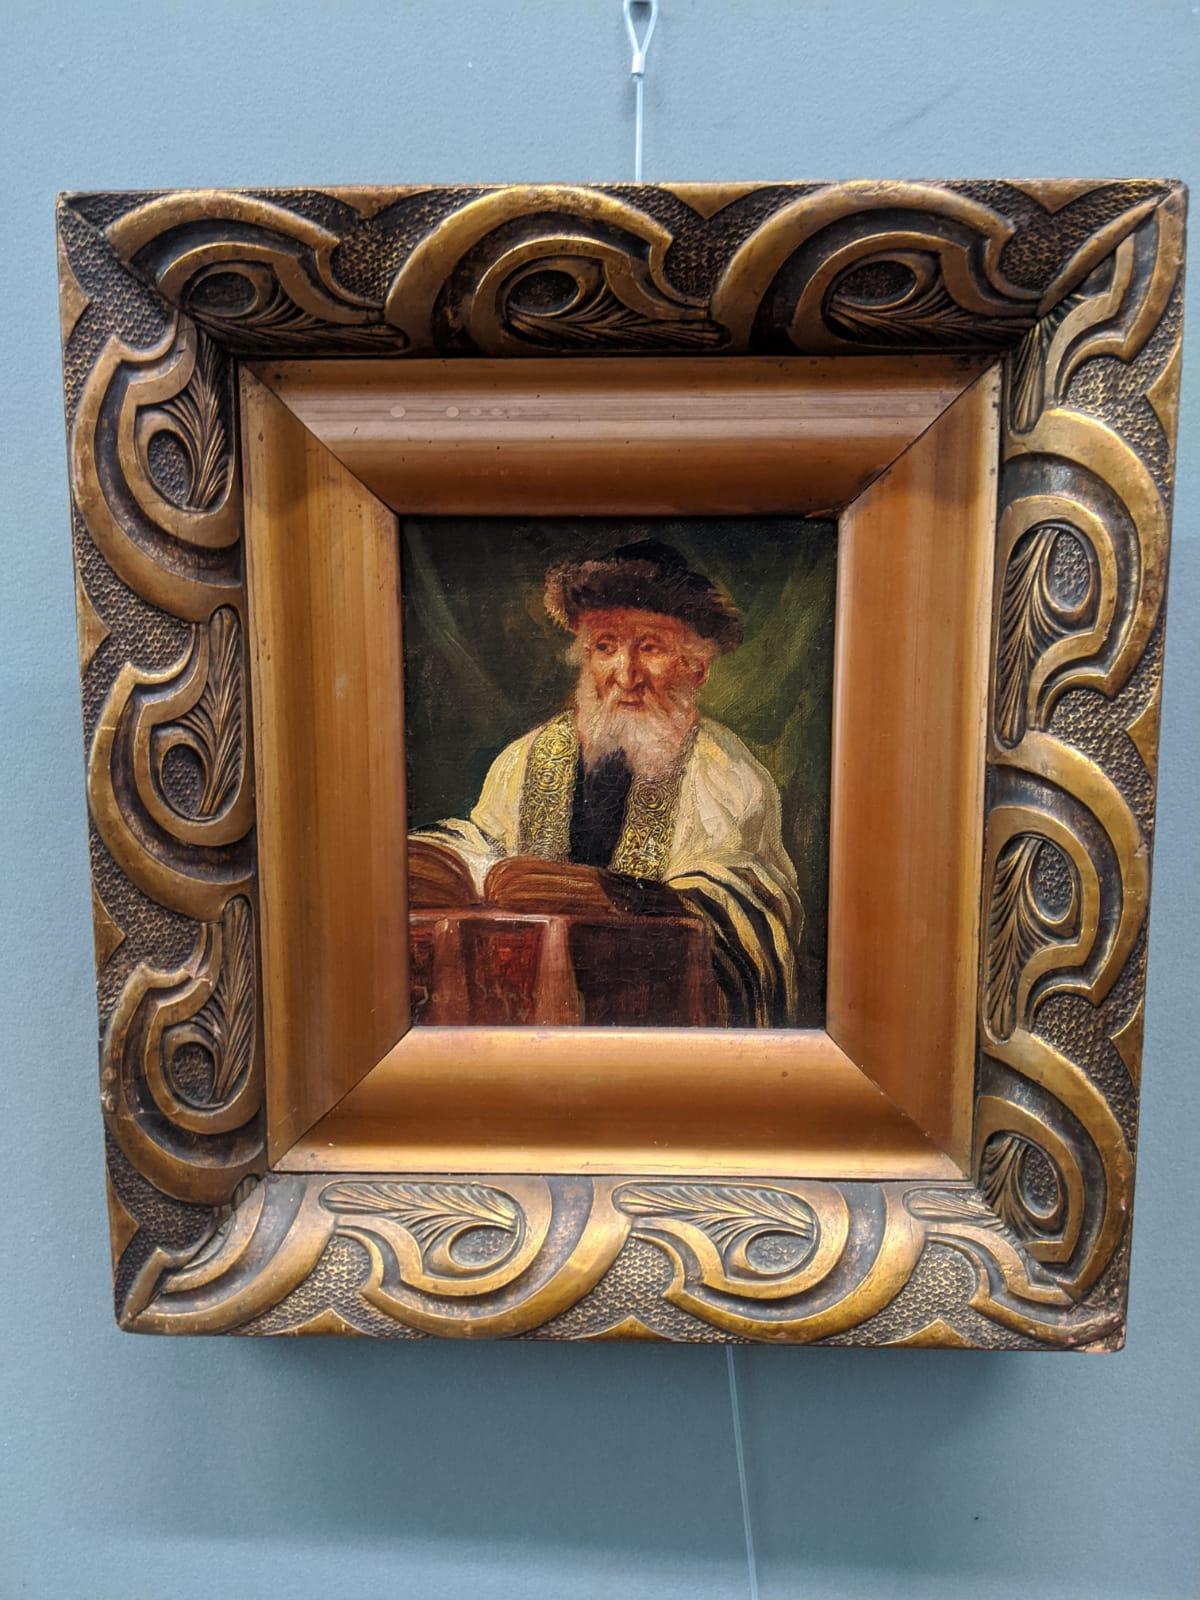 Jose Schneider (American/Spanish, 1848-1893), Rabbi Studying and Rabbi, oils on canvas, both - Image 6 of 7